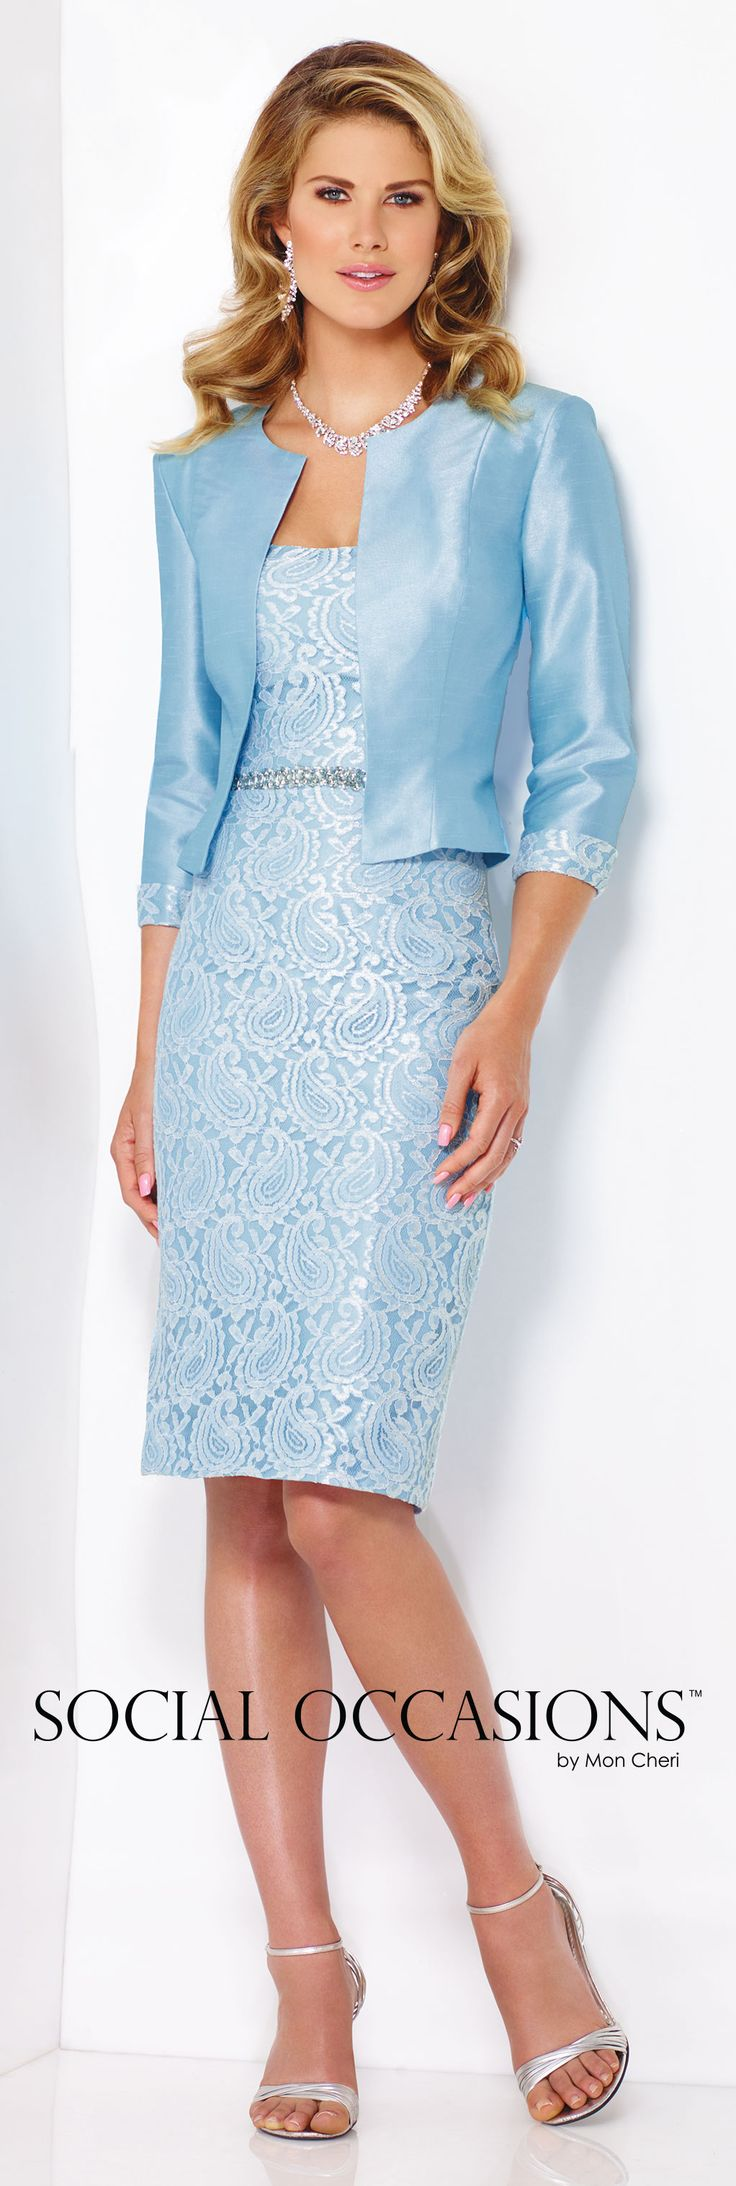 Social Occasions by Mon Cheri Spring 2016 - Style No. 116838 #shorteveningdresses